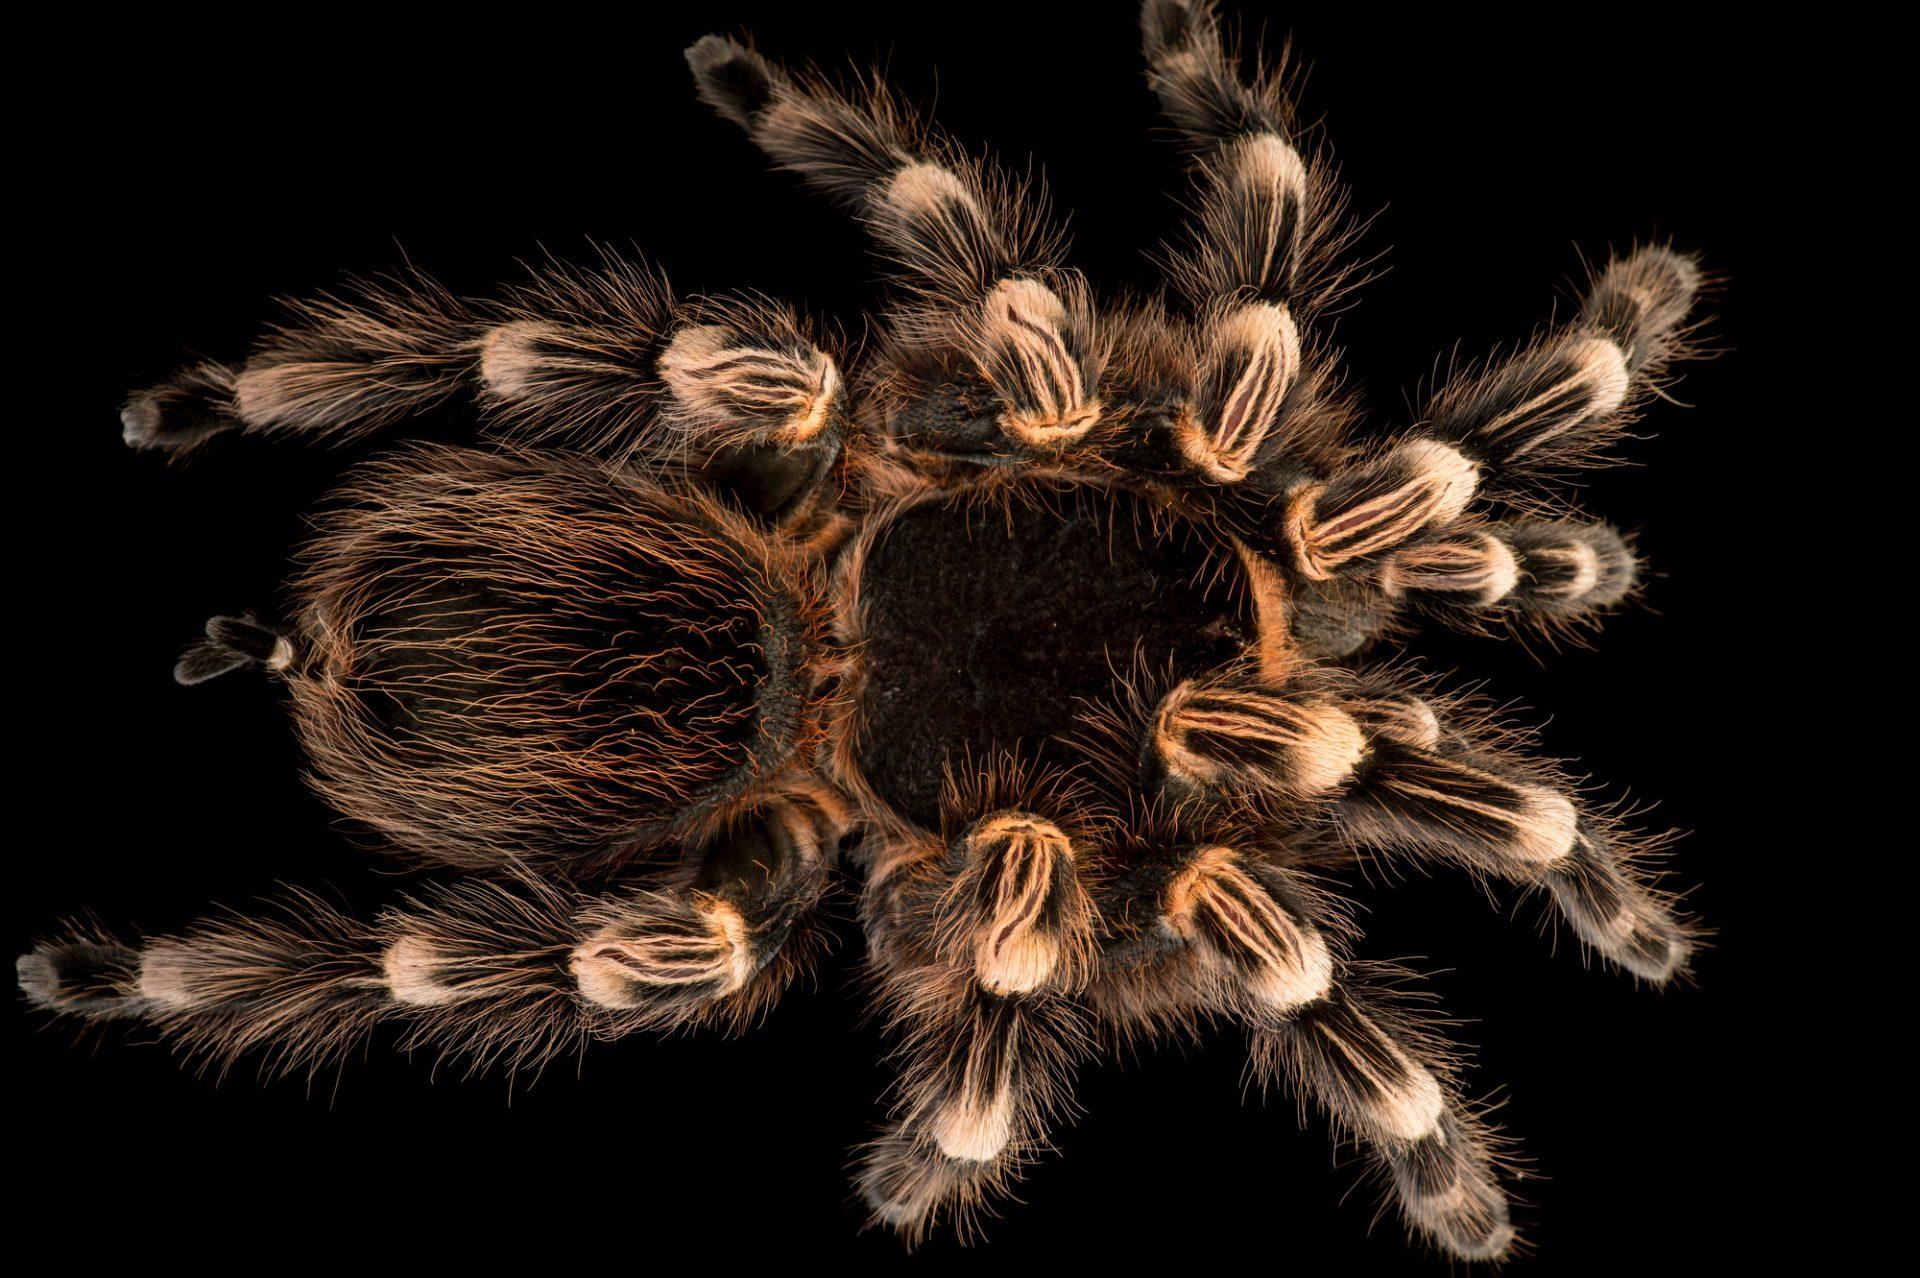 Picture of a Brazilian whiteknee tarantula (Acanthoscurria geniculata) at the Central Florida Zoo.